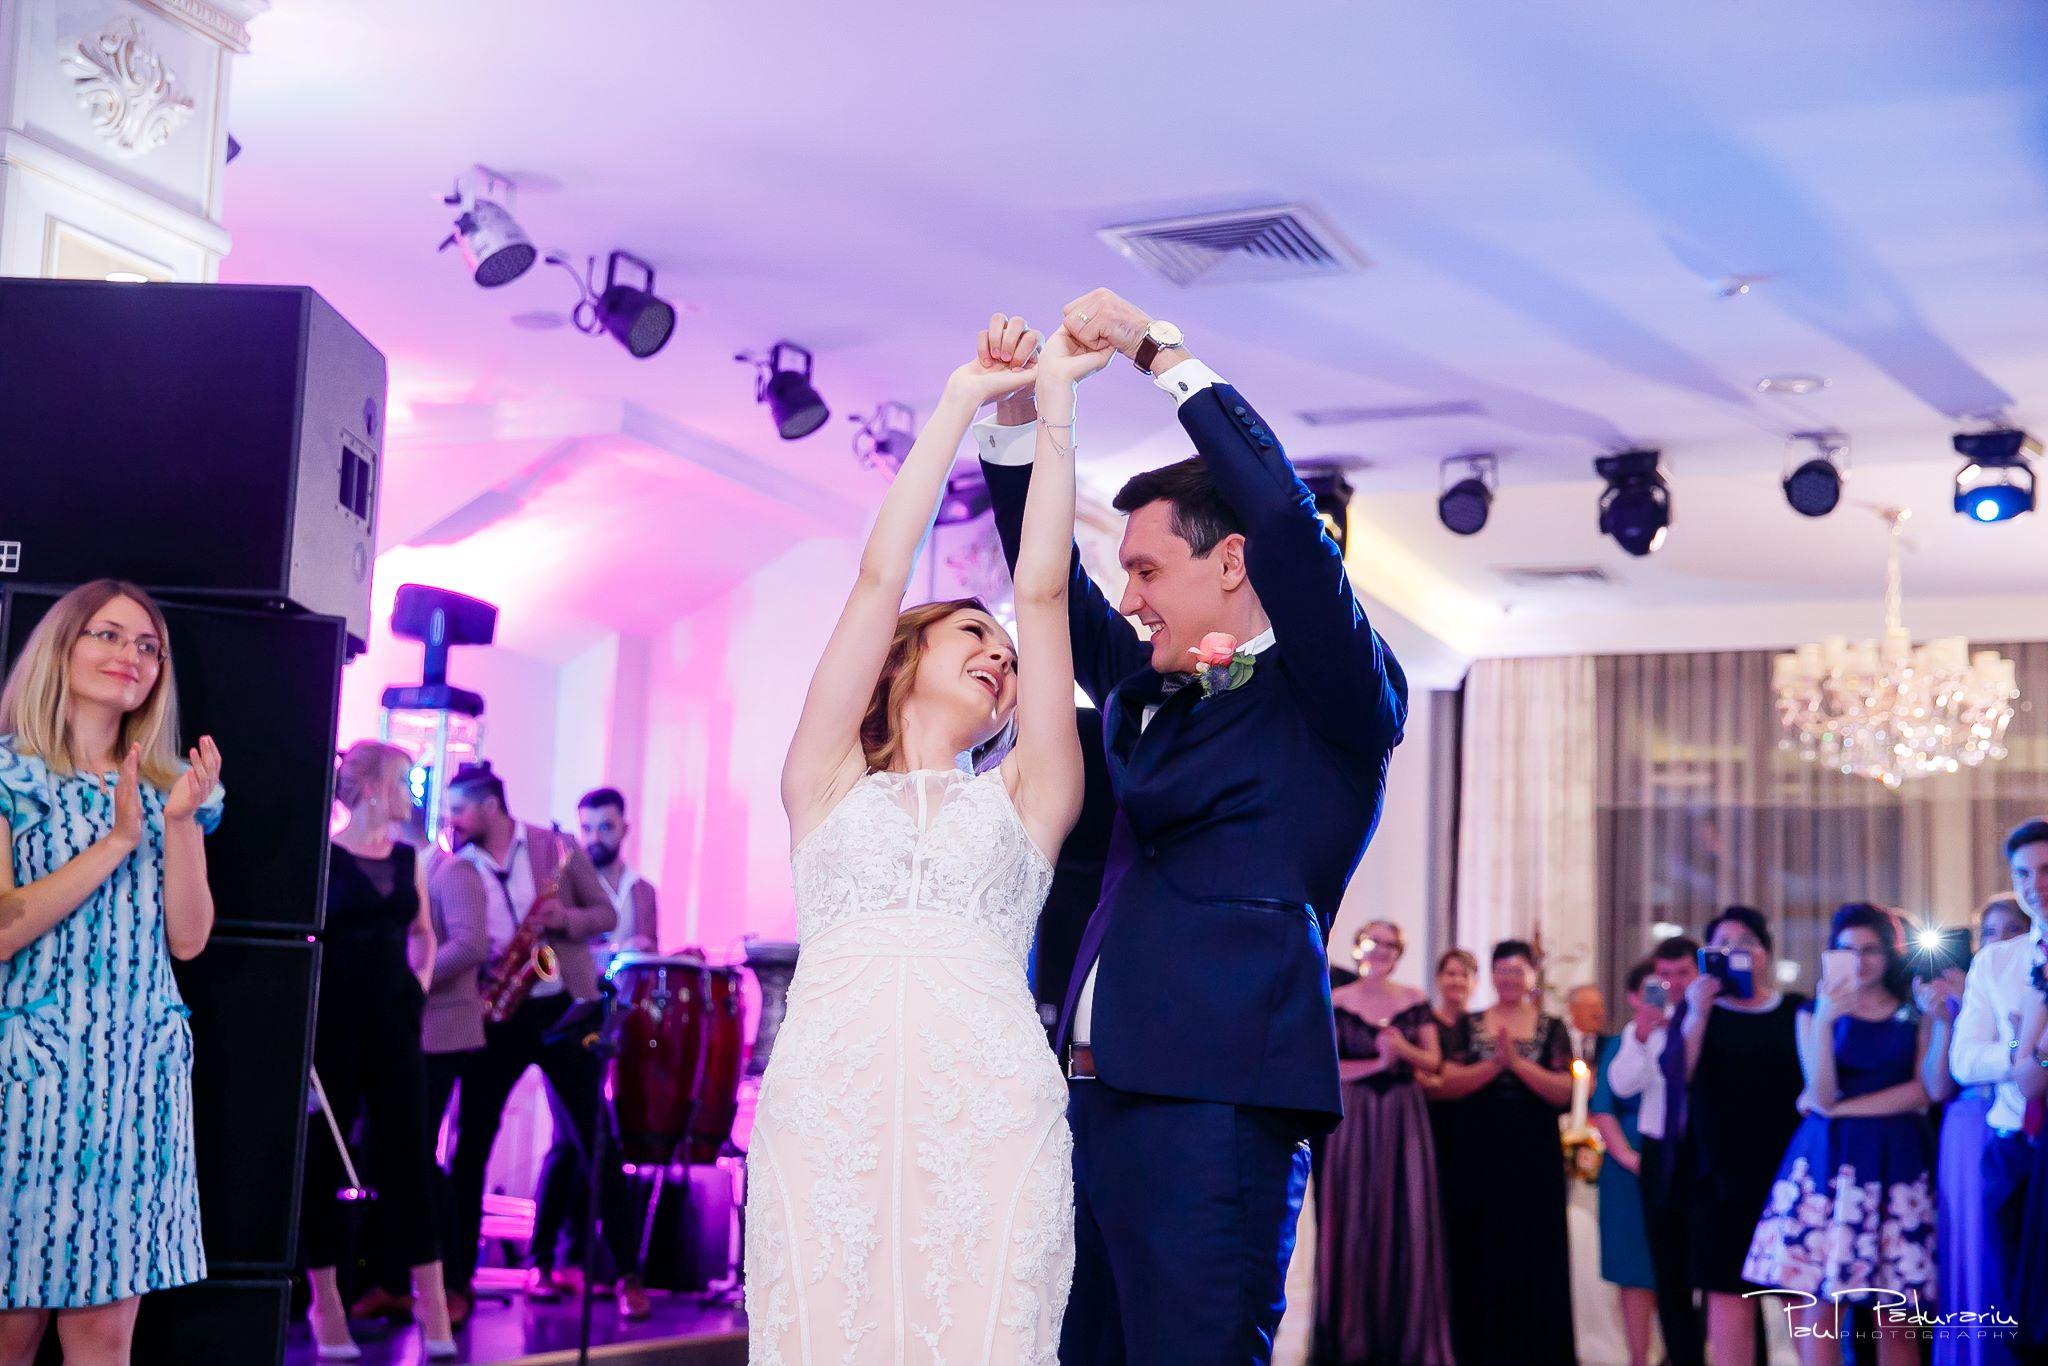 Nicoleta si Catalin fotografie nunta Iasi Restaurant Capitol fotograf paul padurariu 2018 6